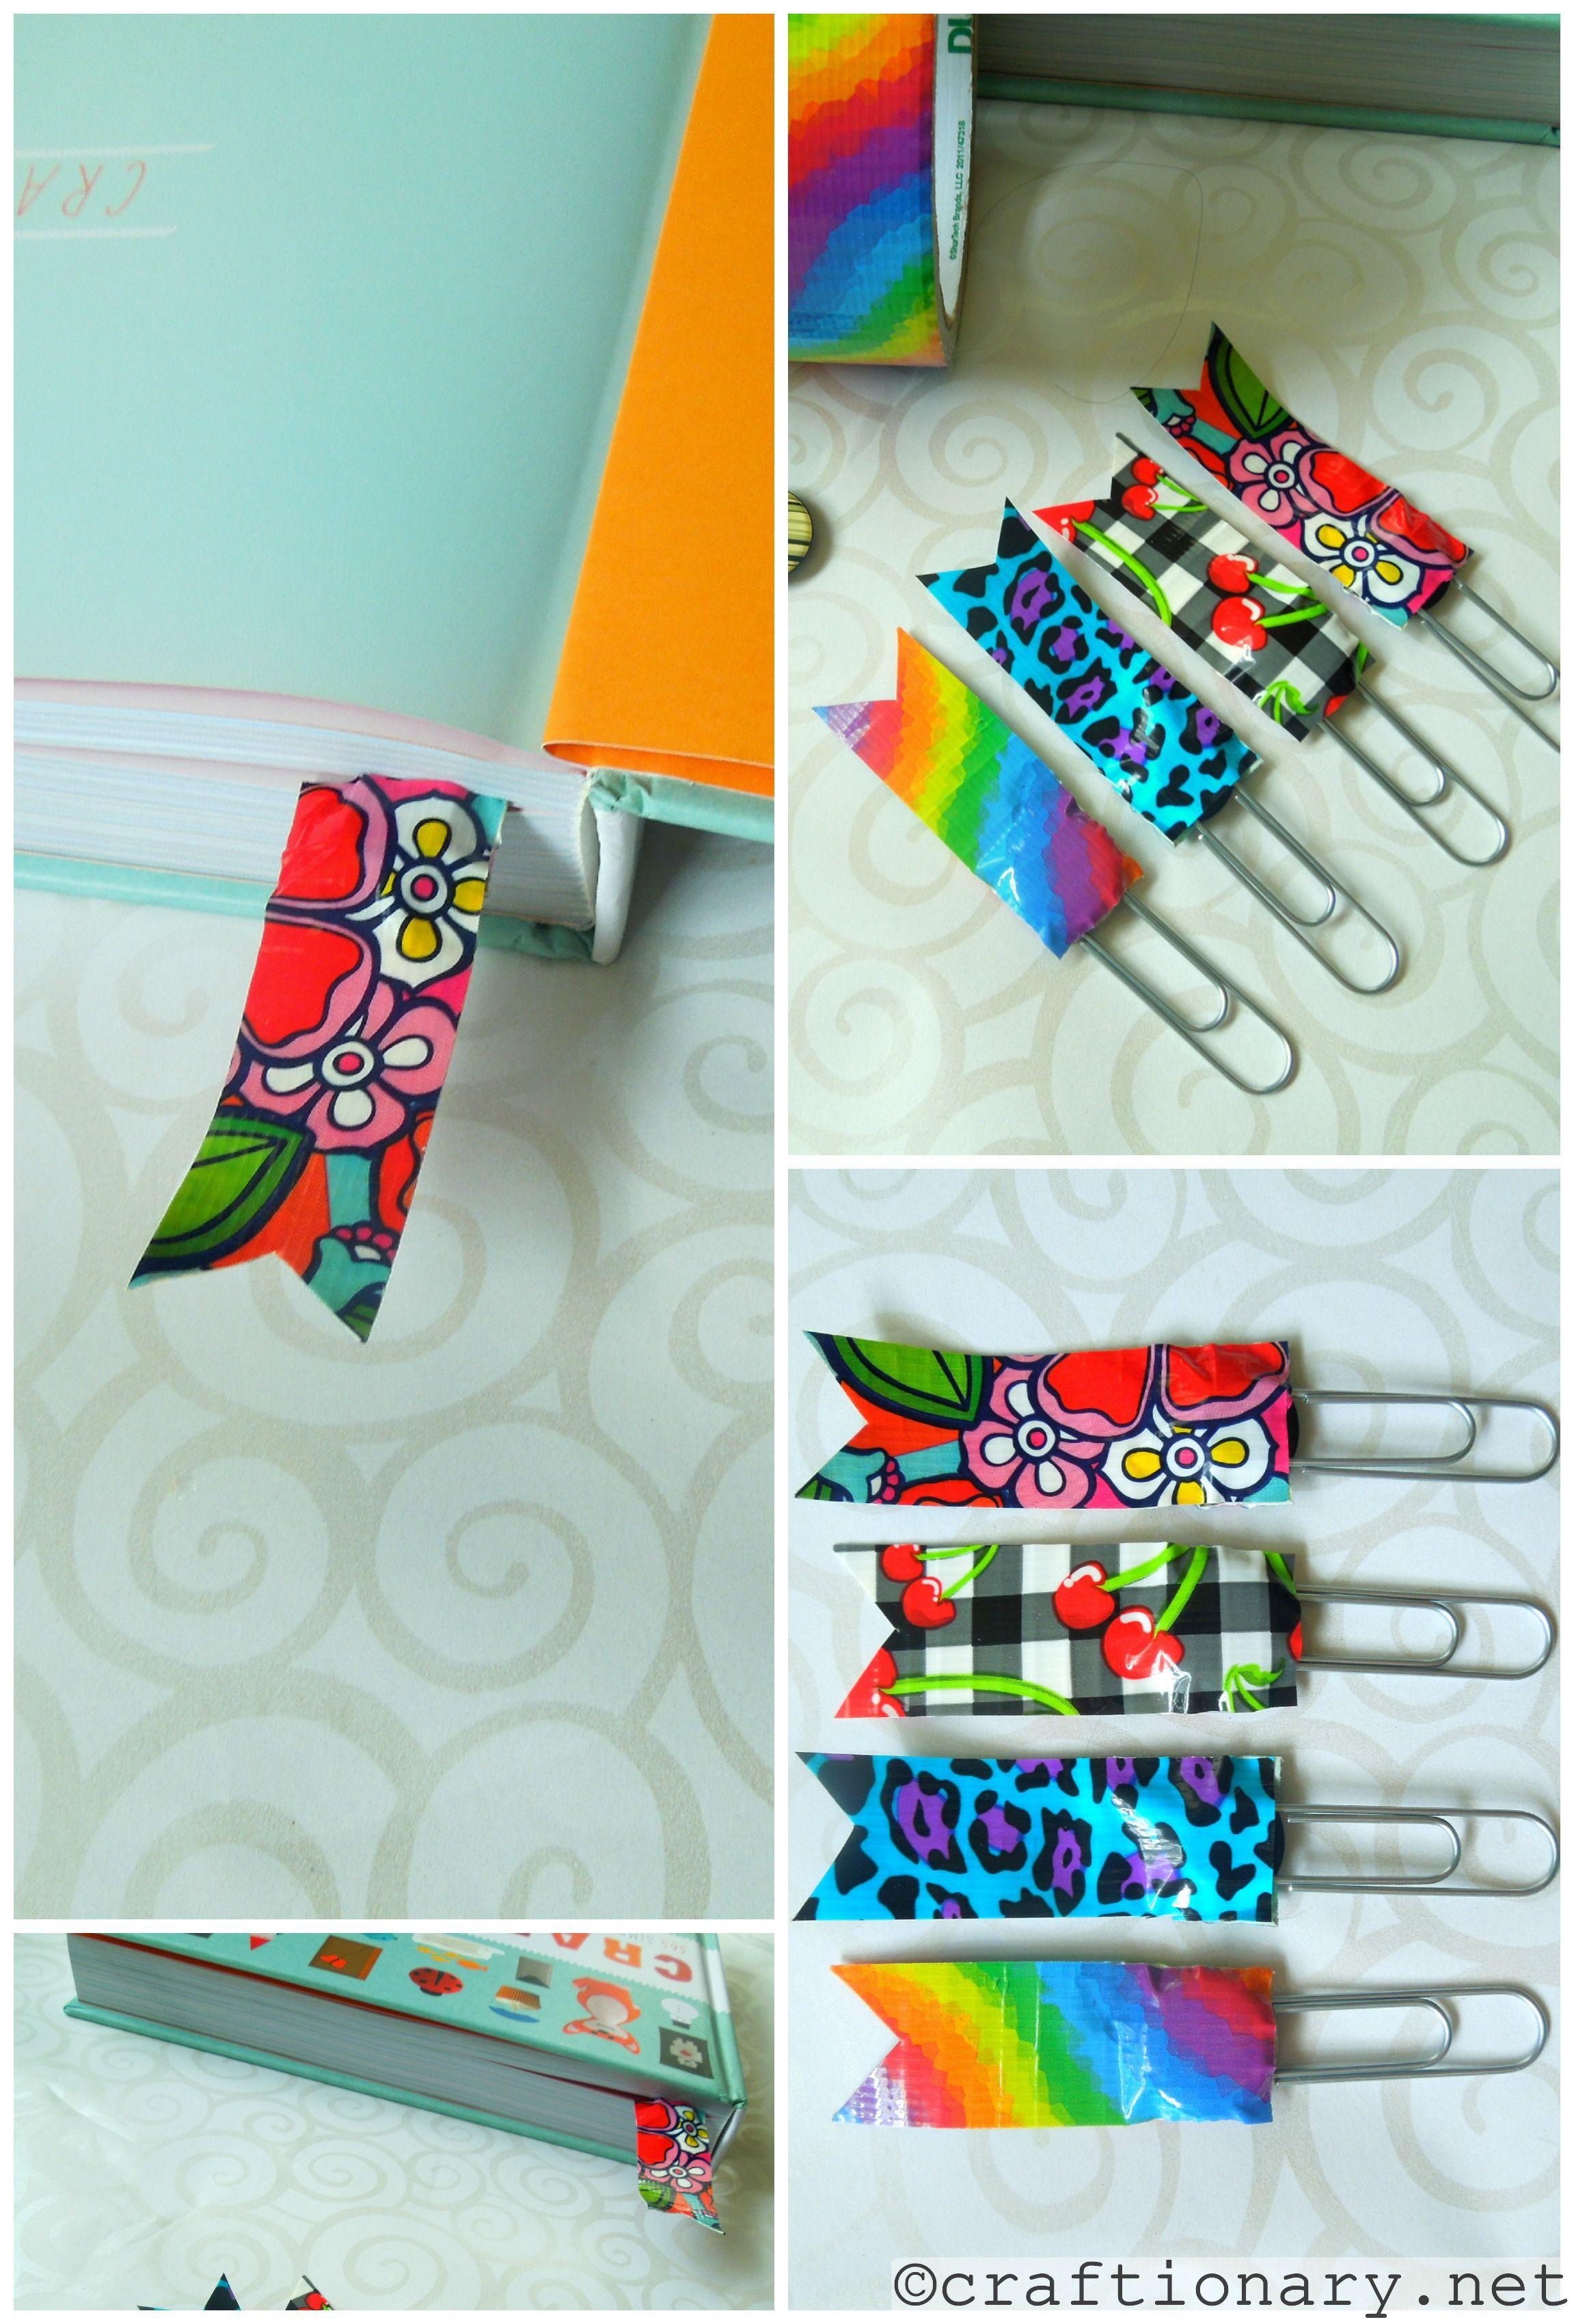 Diy Duct Tape Ideas Make Simple Crafts Duck Tape Crafts Fun